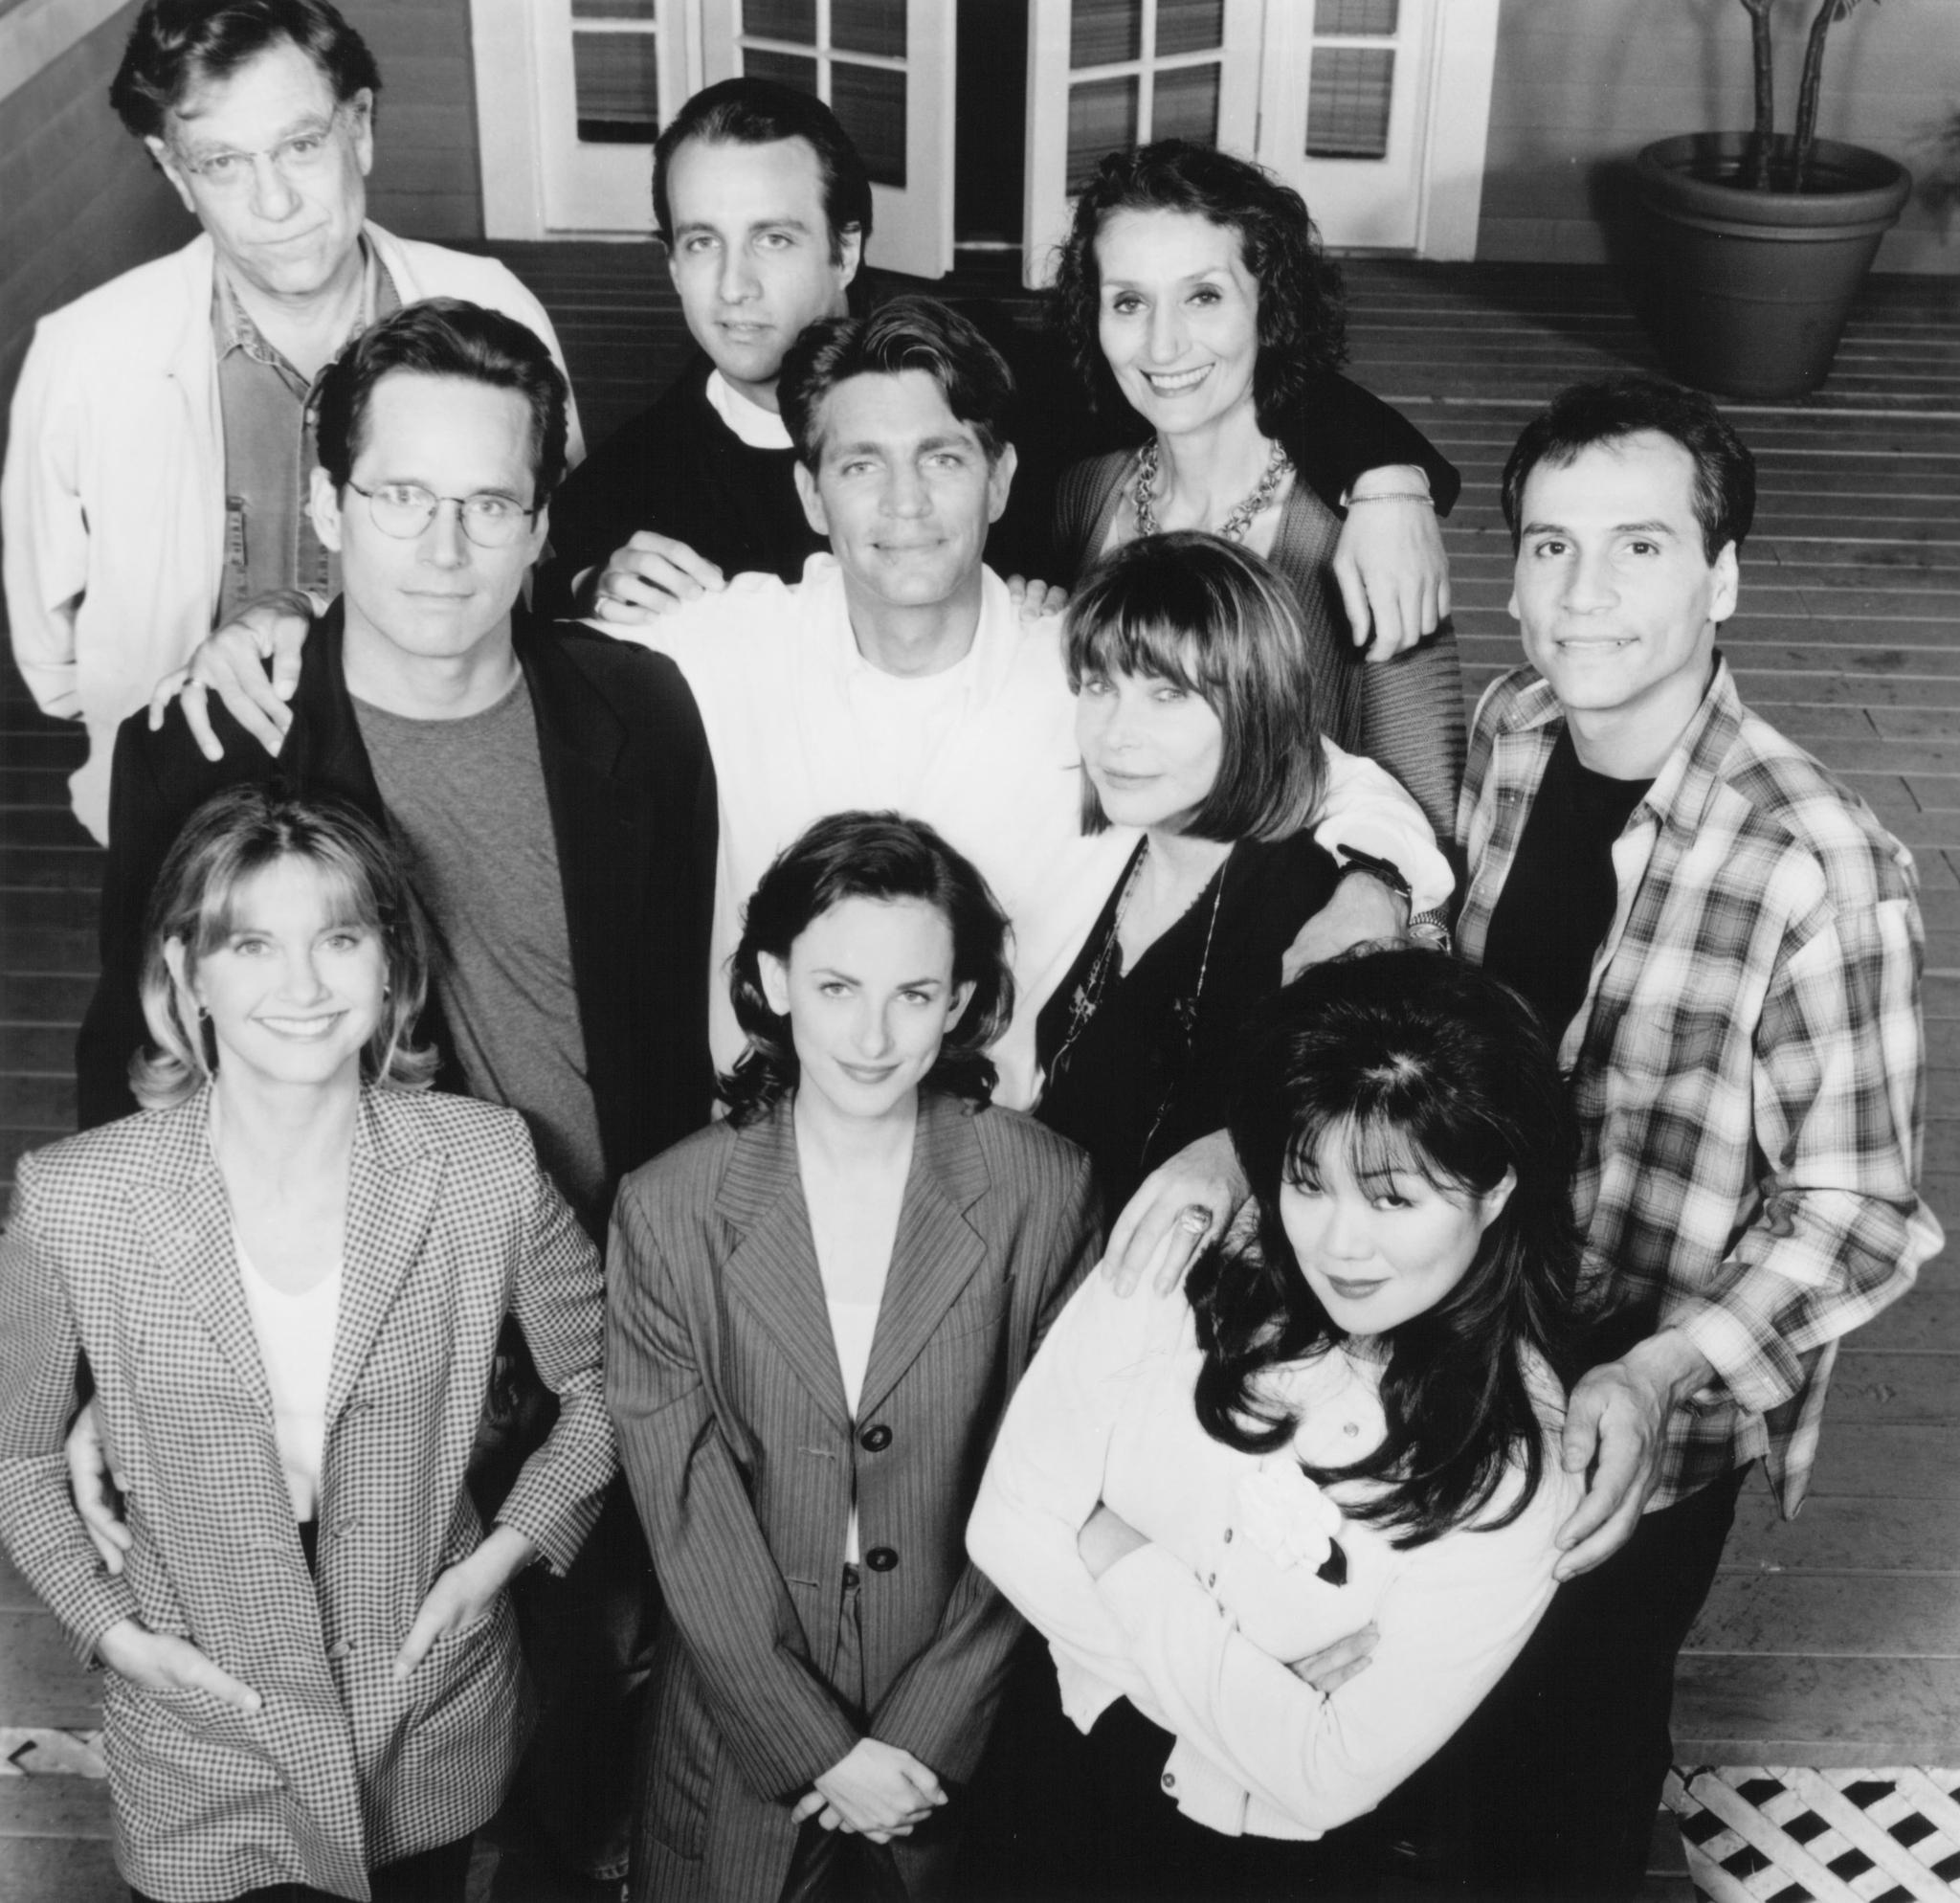 Still of Olivia Newton-John, Eric Roberts, Bronson Pinchot, George Segal, Gregory Harrison, Dimitra Arliss, Margaret Cho, Marlee Matlin and Paul Regina in It's My Party (1996)